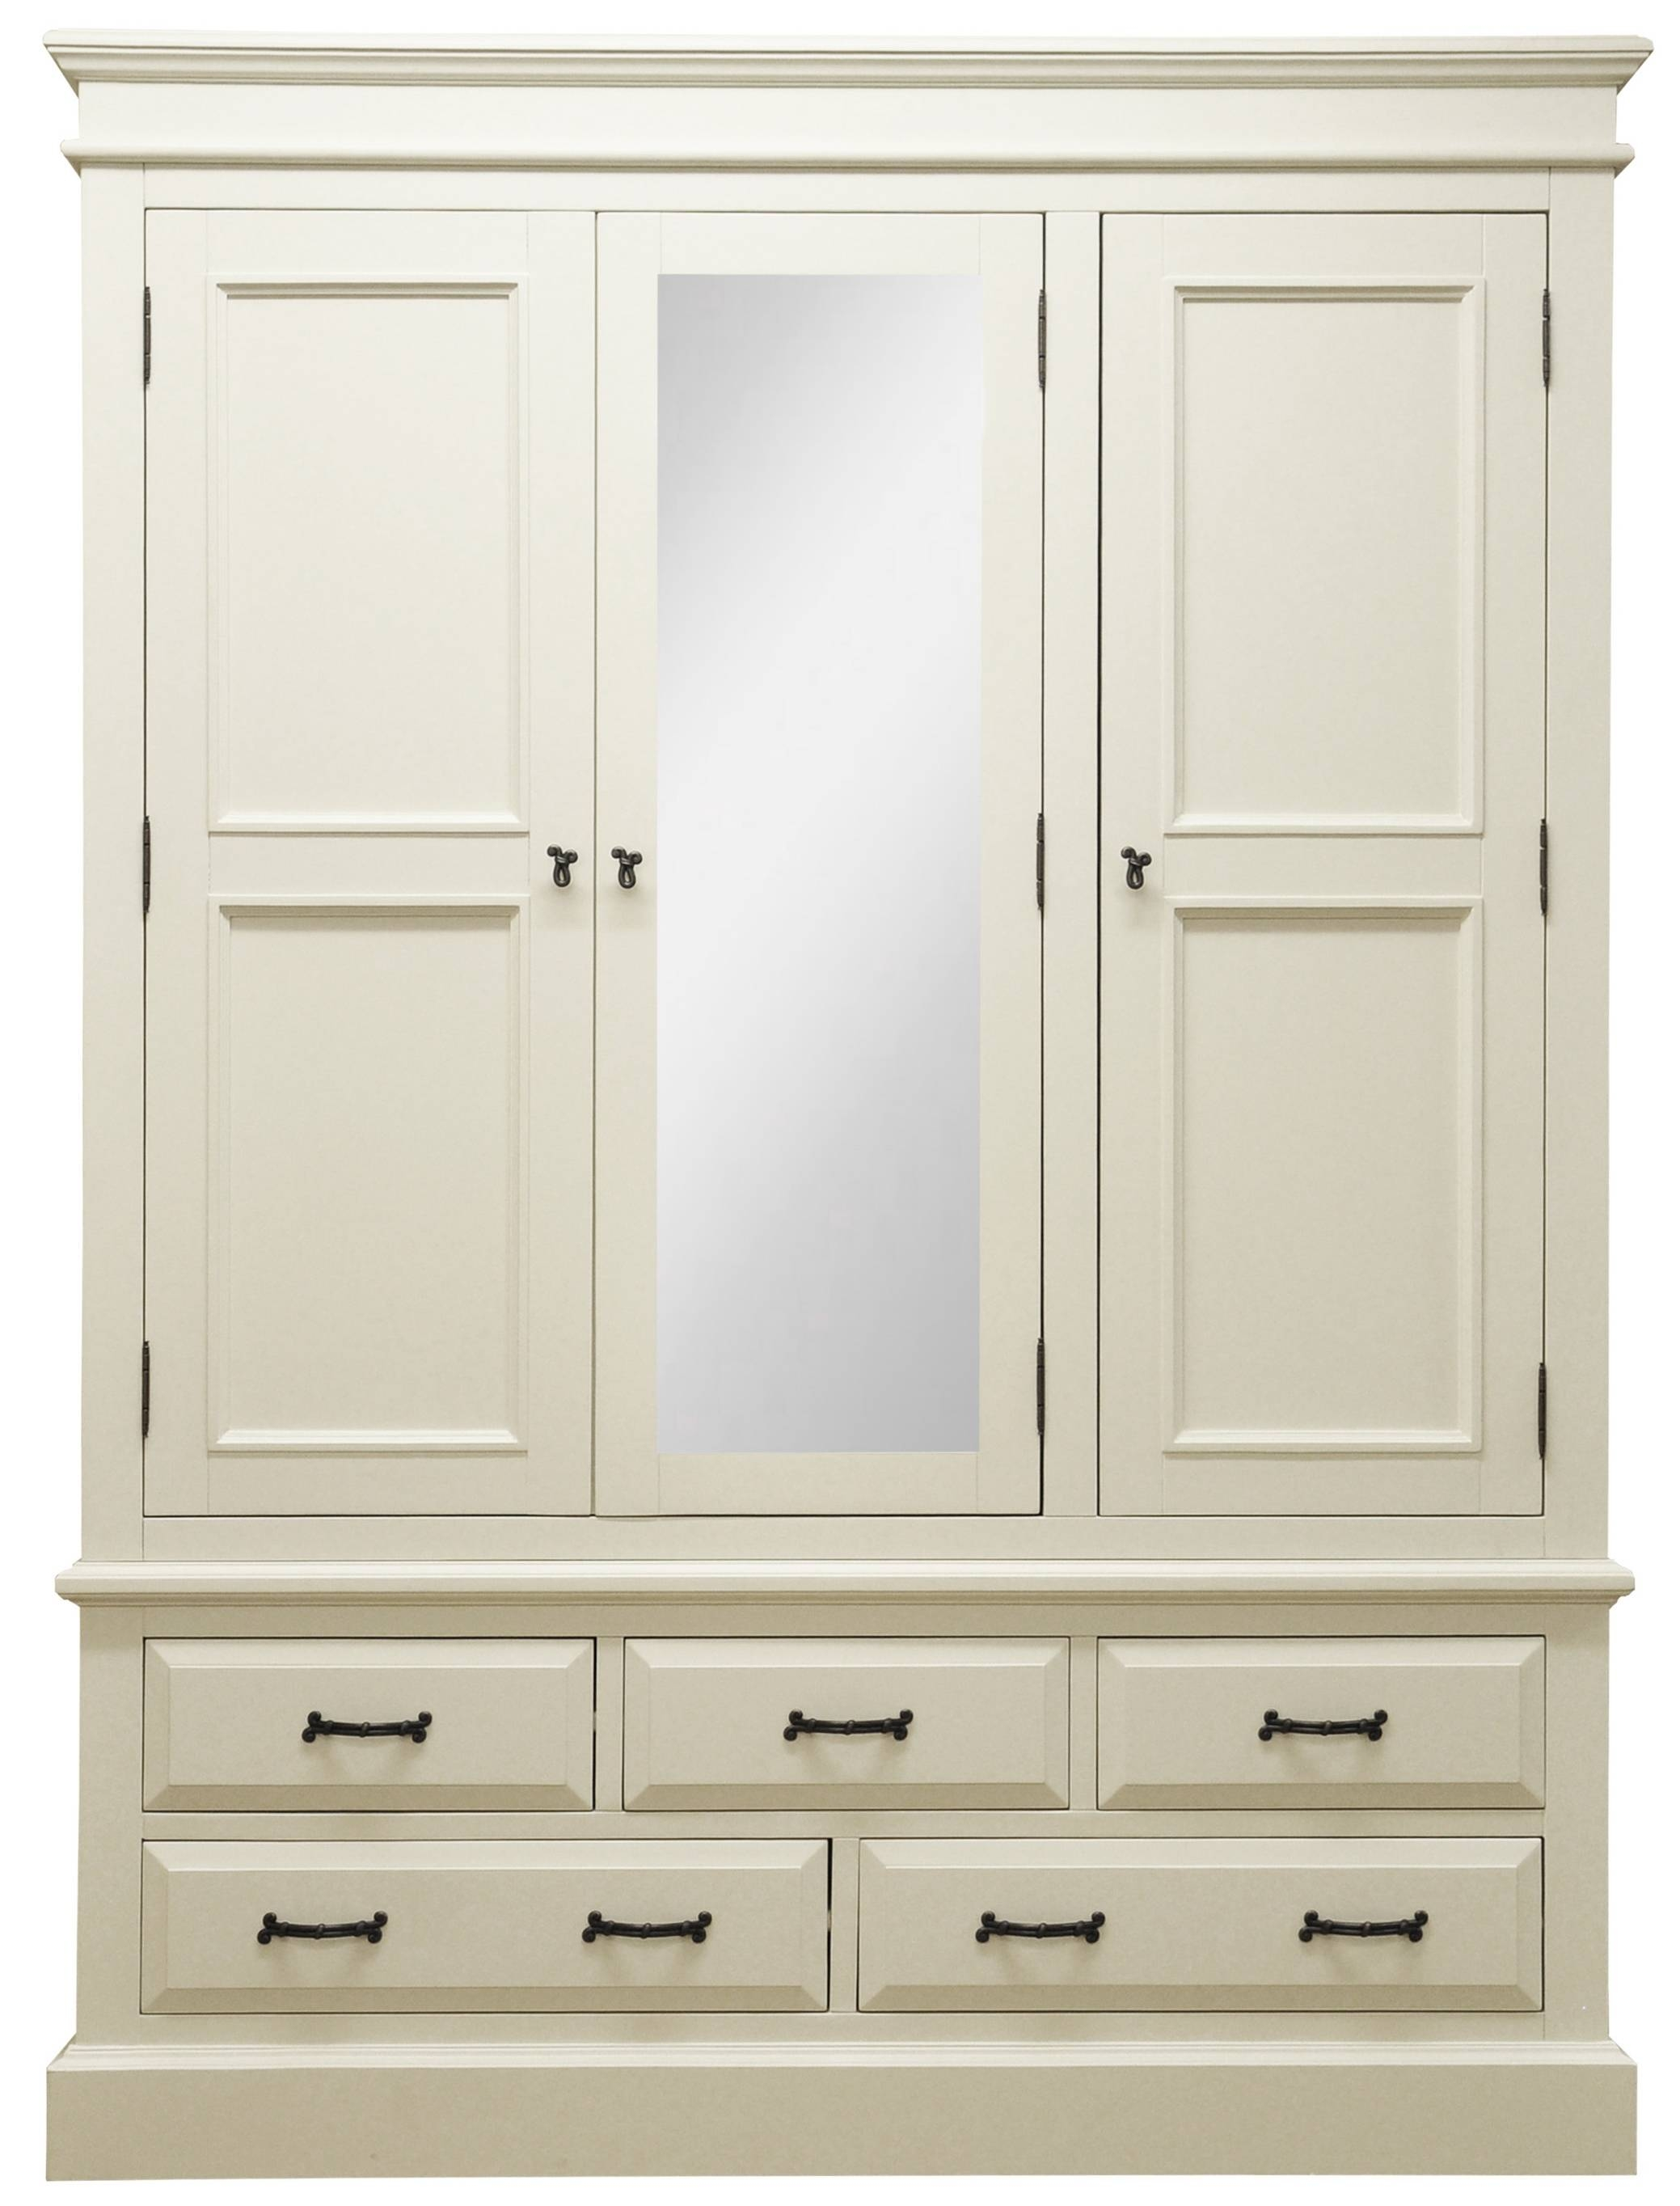 Wardrobes : Henleaze 5 Drawer Painted Wardrobe With Mirrorhenleaze with Single White Wardrobes With Mirror (Image 11 of 15)